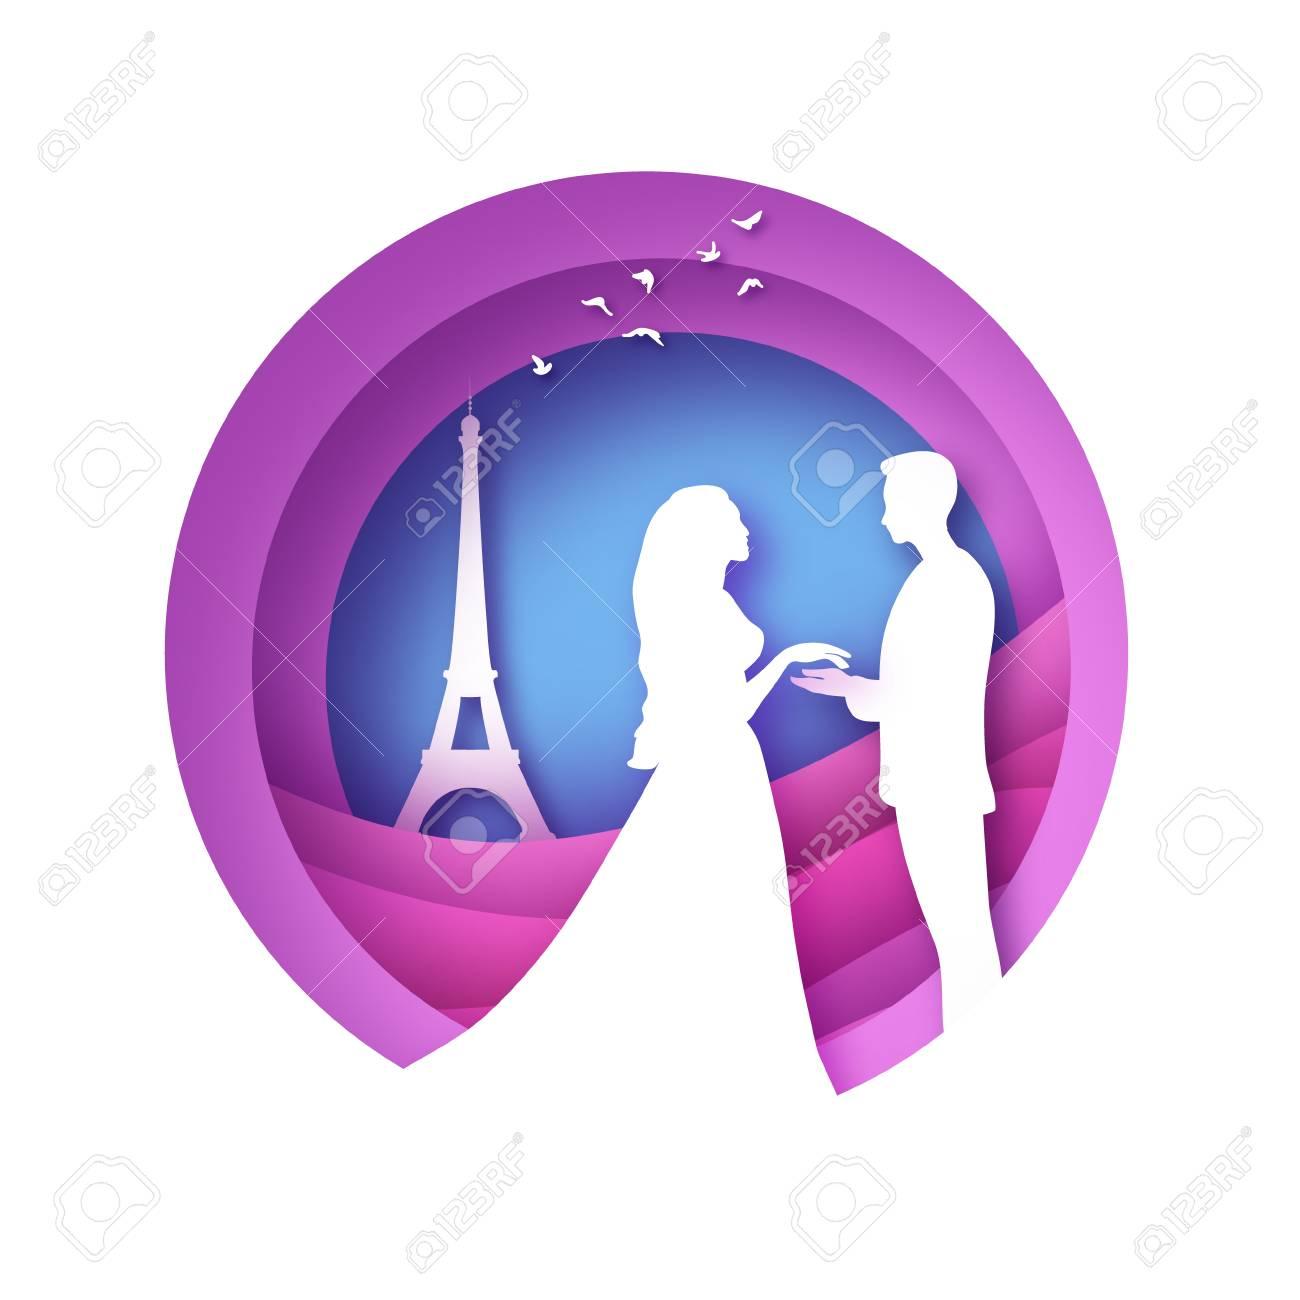 Origamic Architecture, Eiffel Tower, Paris | Pliage | 1300x1300